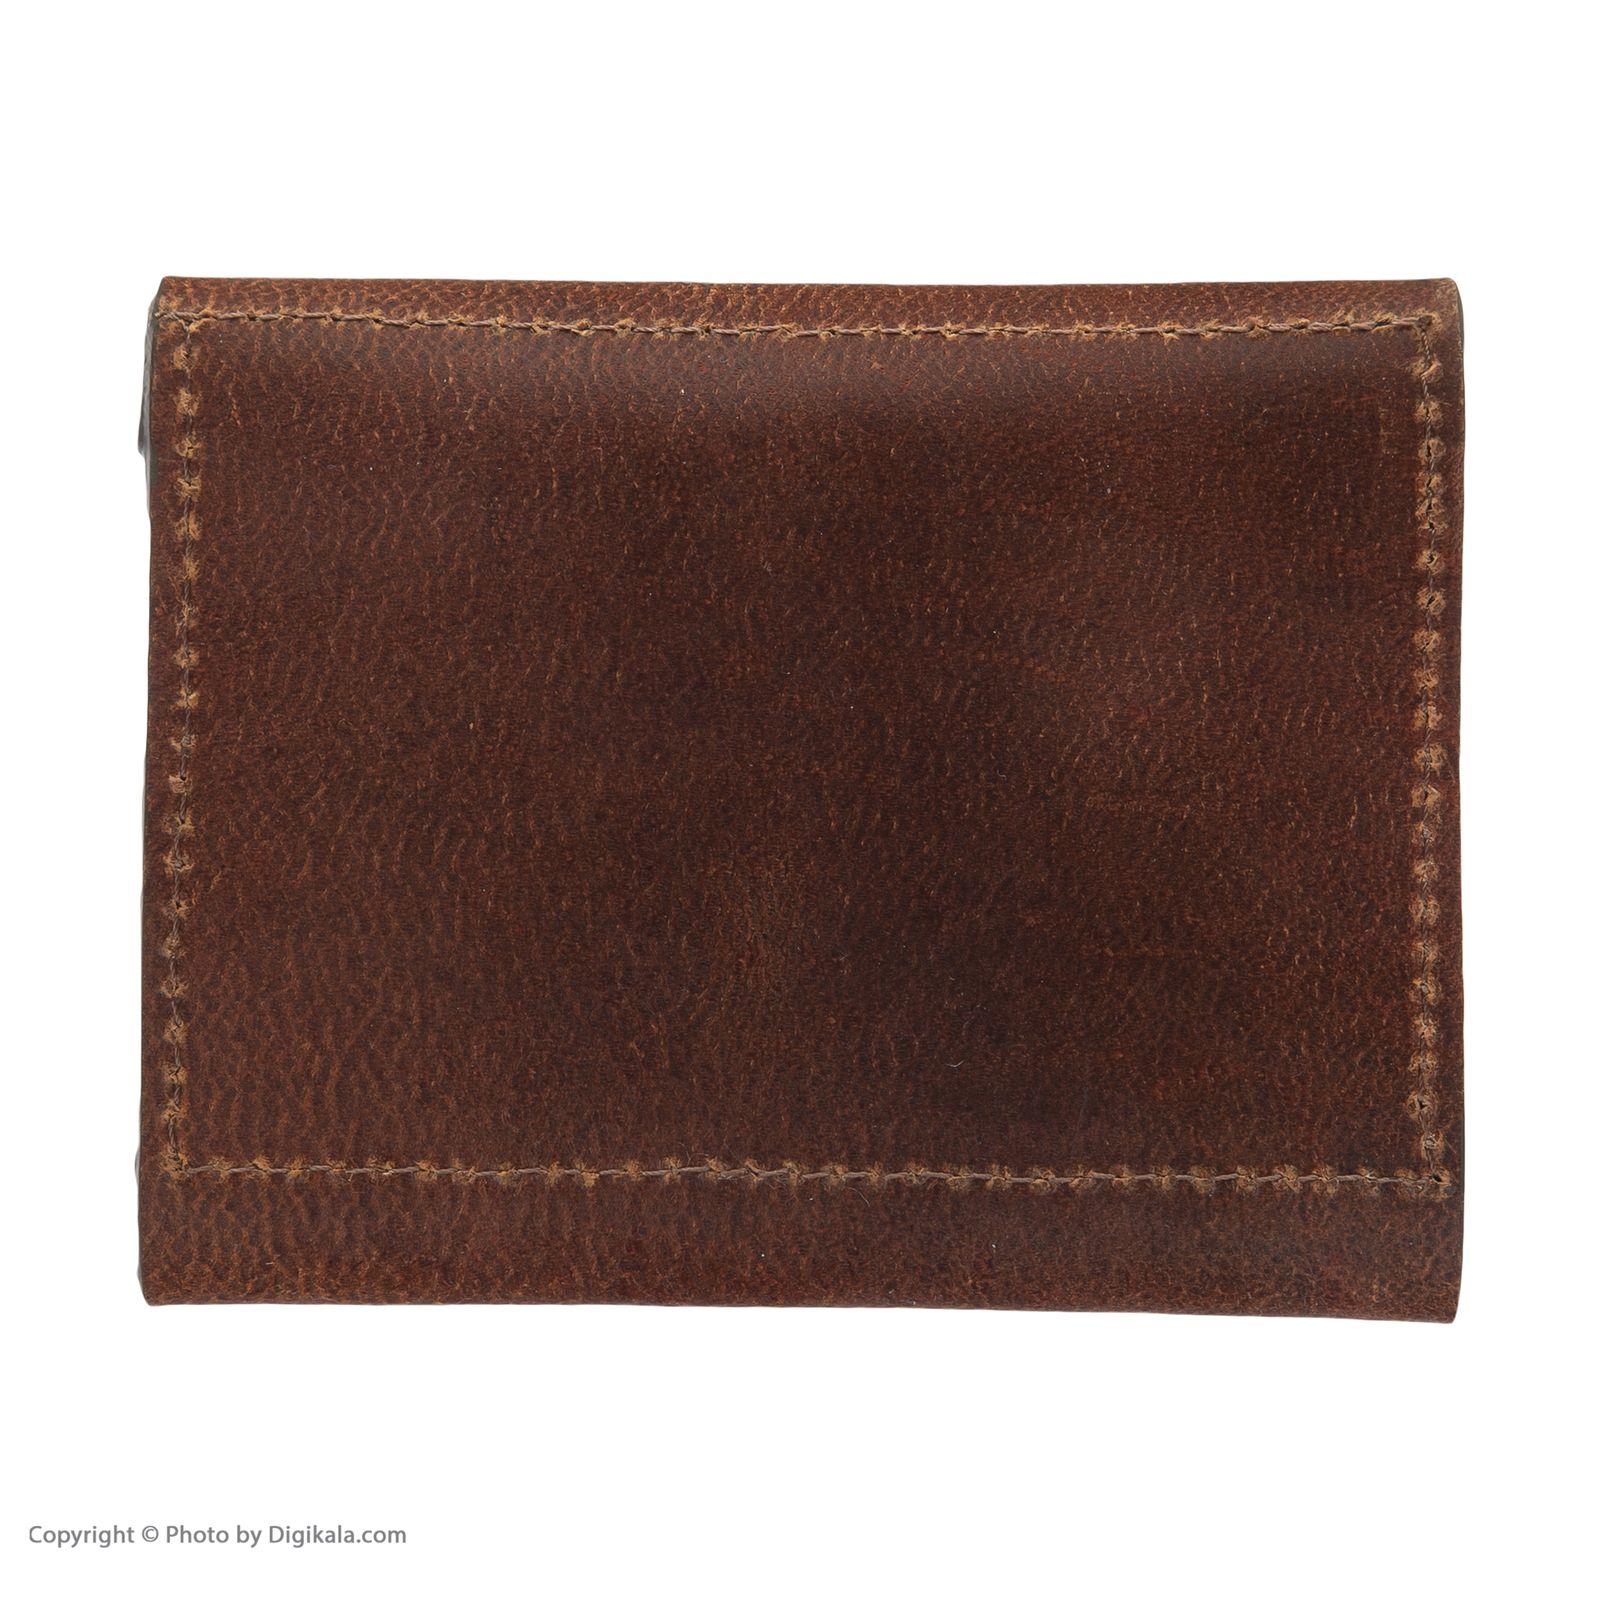 کیف پول مردانه چرم لانکا مدل PC-9-04 main 1 2